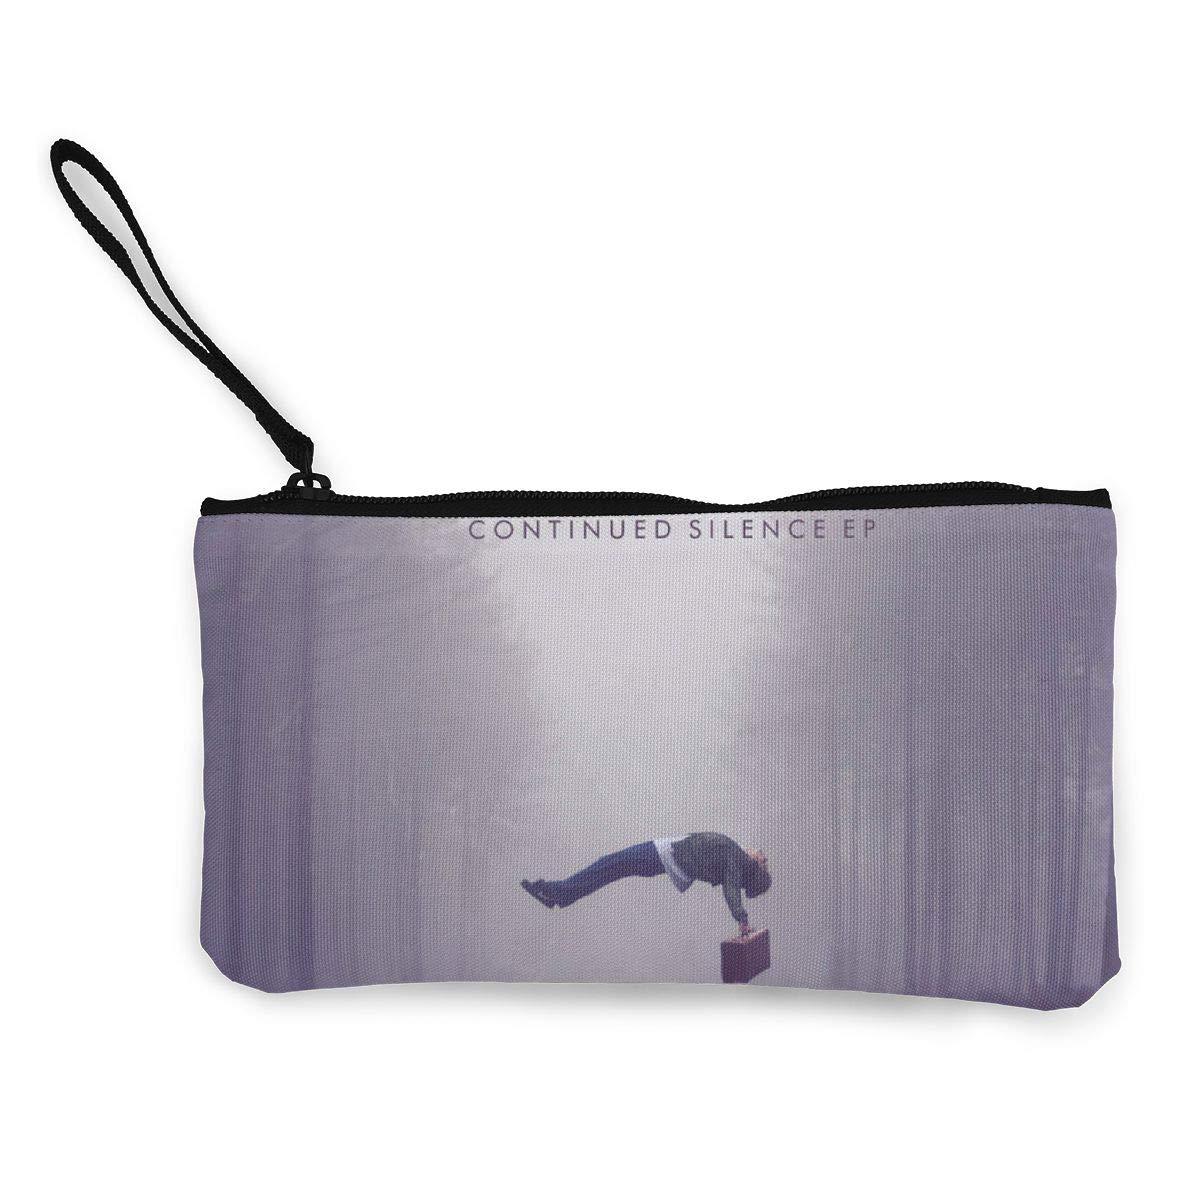 Im/_agine Dra/_gons Canvas Coin Purse Pouch Zipper Wristlet Wallet,Cellphone,Make Up Bag,Handle Key Holder